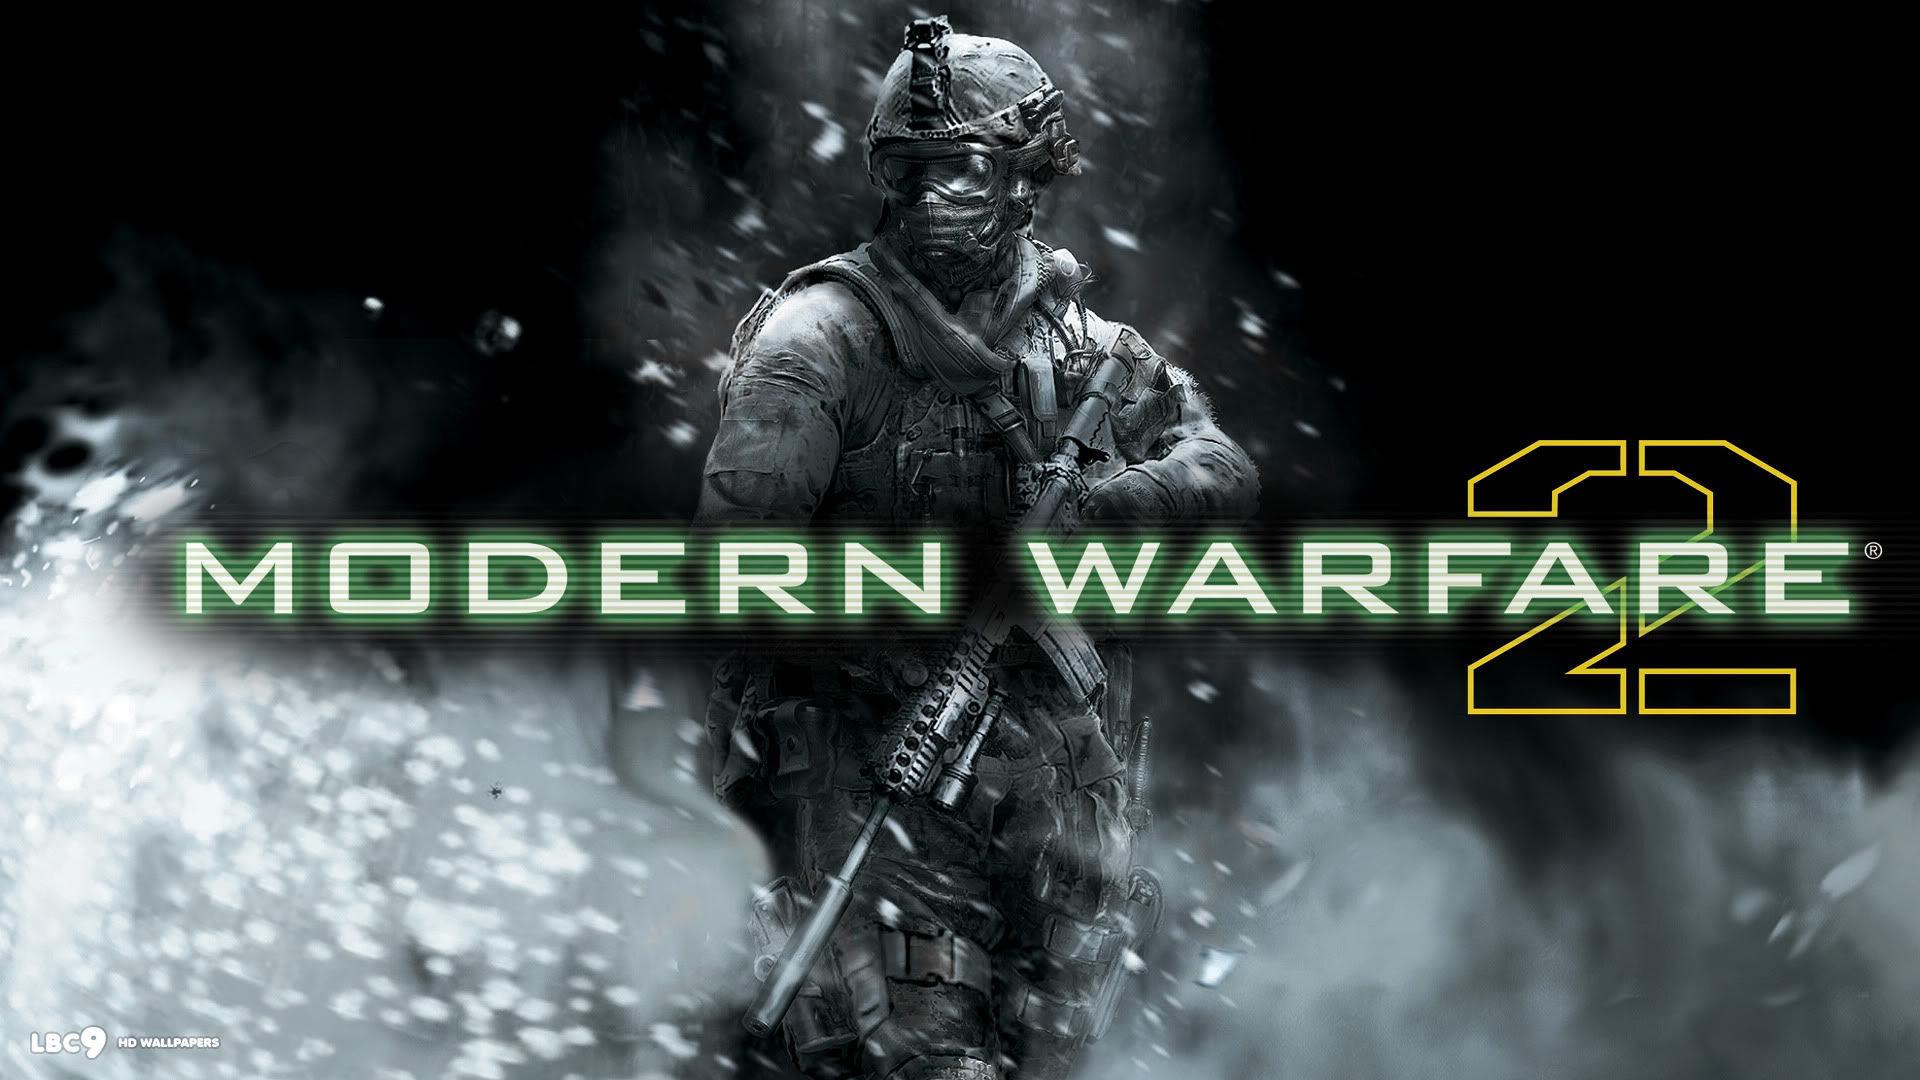 Modern Warfare 2 Background 78 Pictures